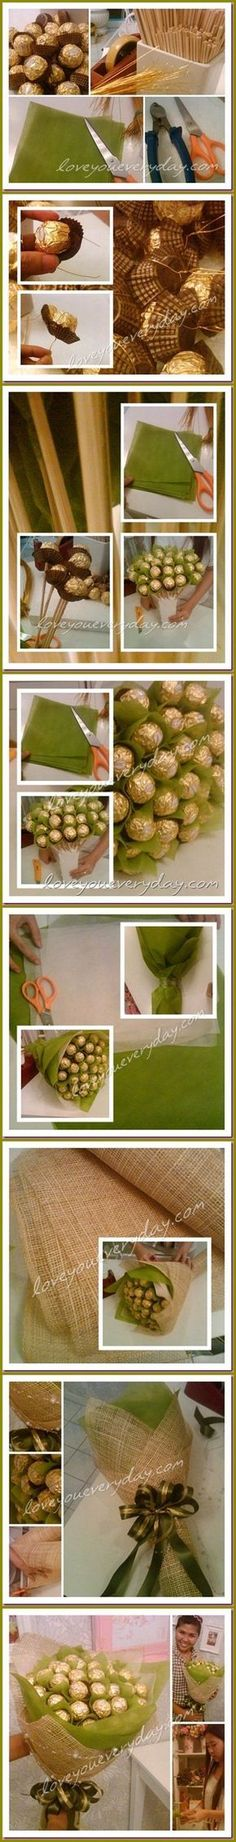 DIY - Chocolate Flower Bouquet - Ramo de Ferrero Rocher